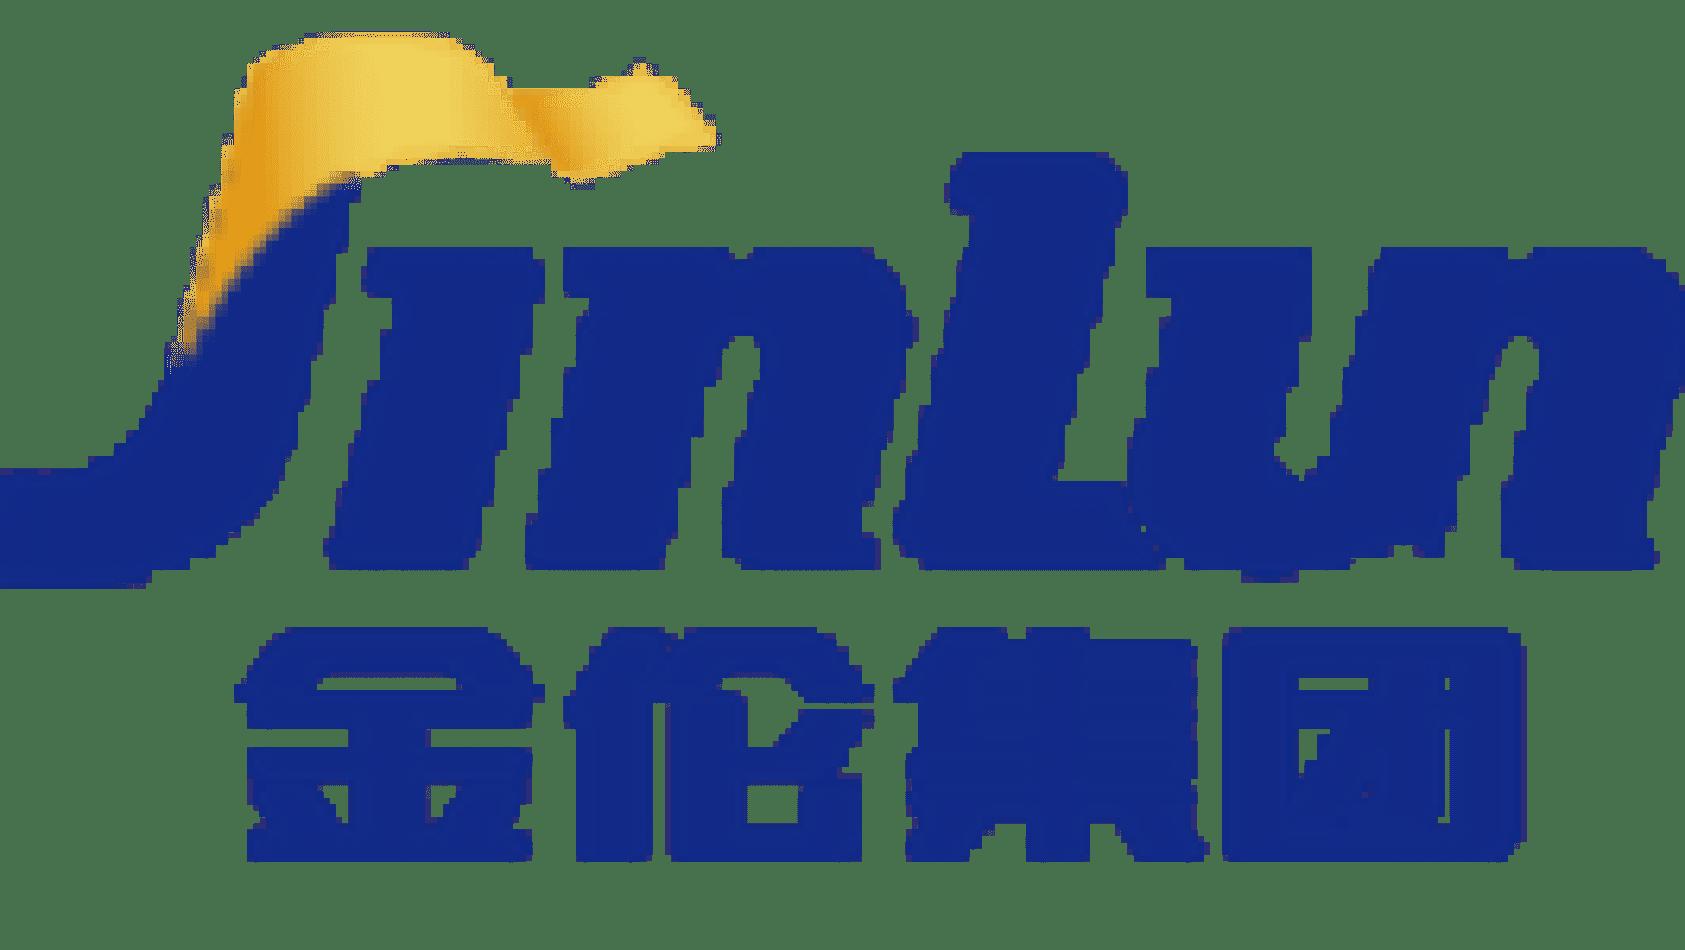 SUZHOU JINGUAN TEXTILES IMP & EXP CO., LTD